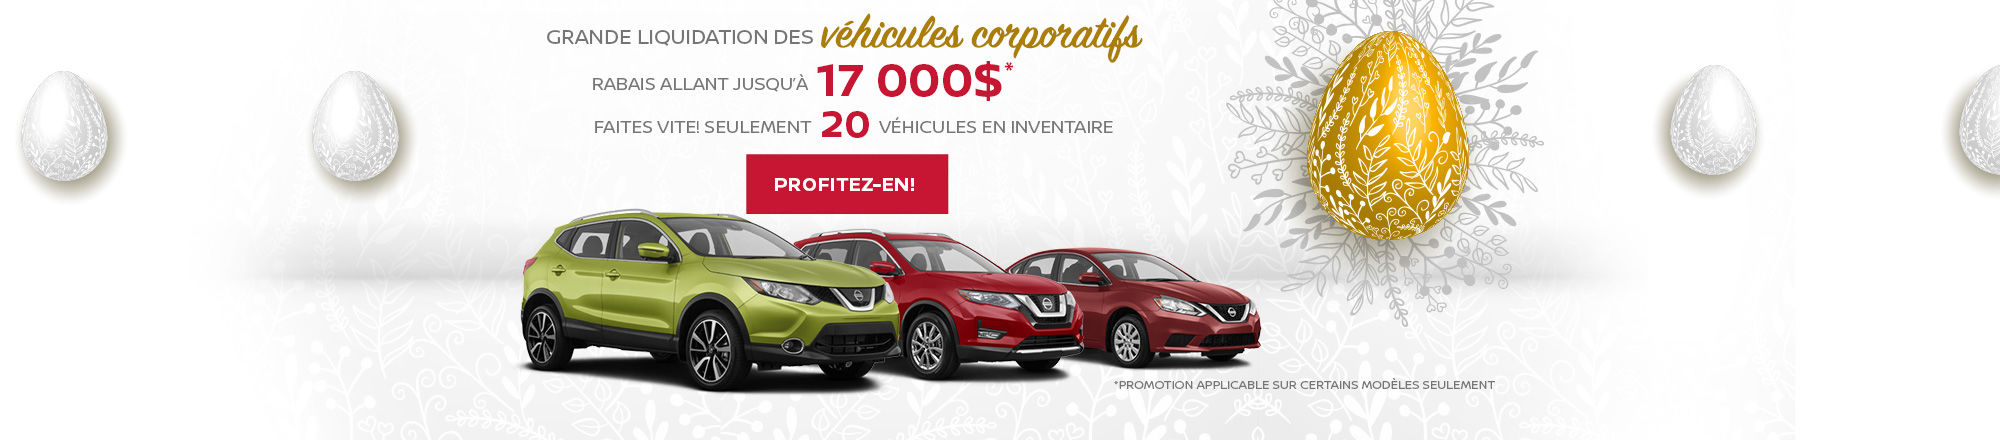 Grande liquidation des véhicules corporatifs